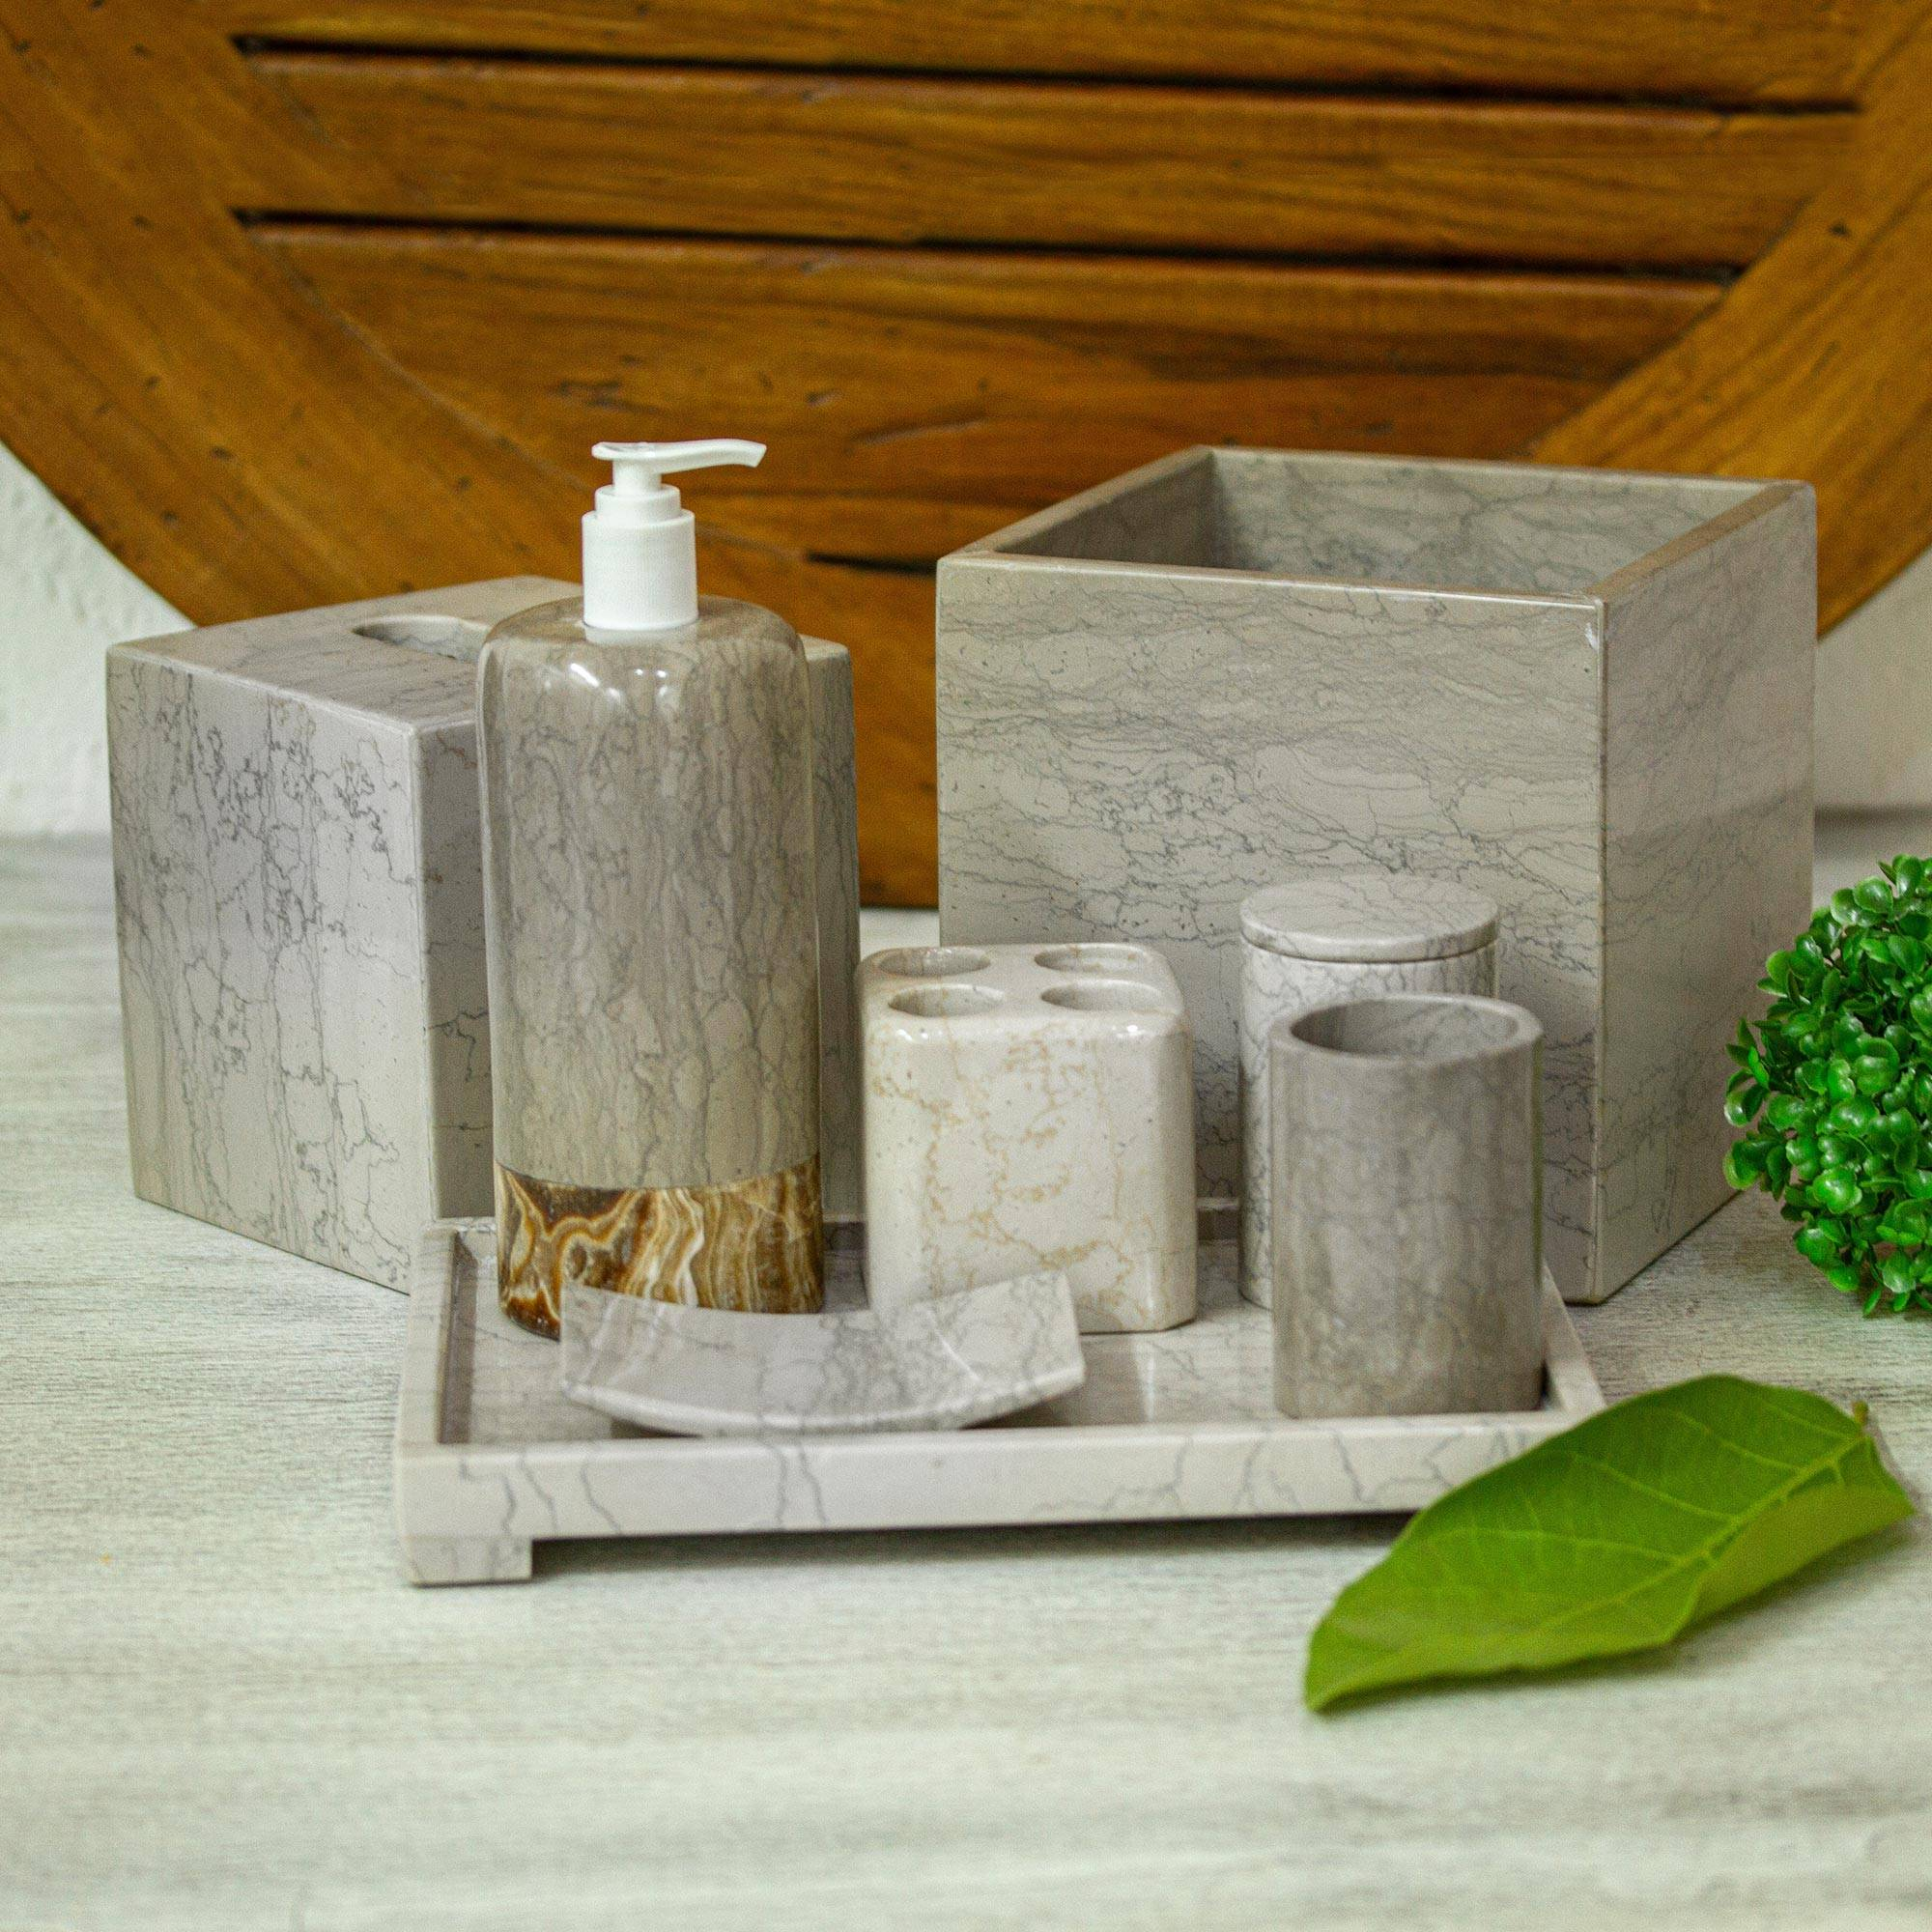 Marble And Onyx Stone Bathe Accessory Set 8 Pieces Patrician Novica